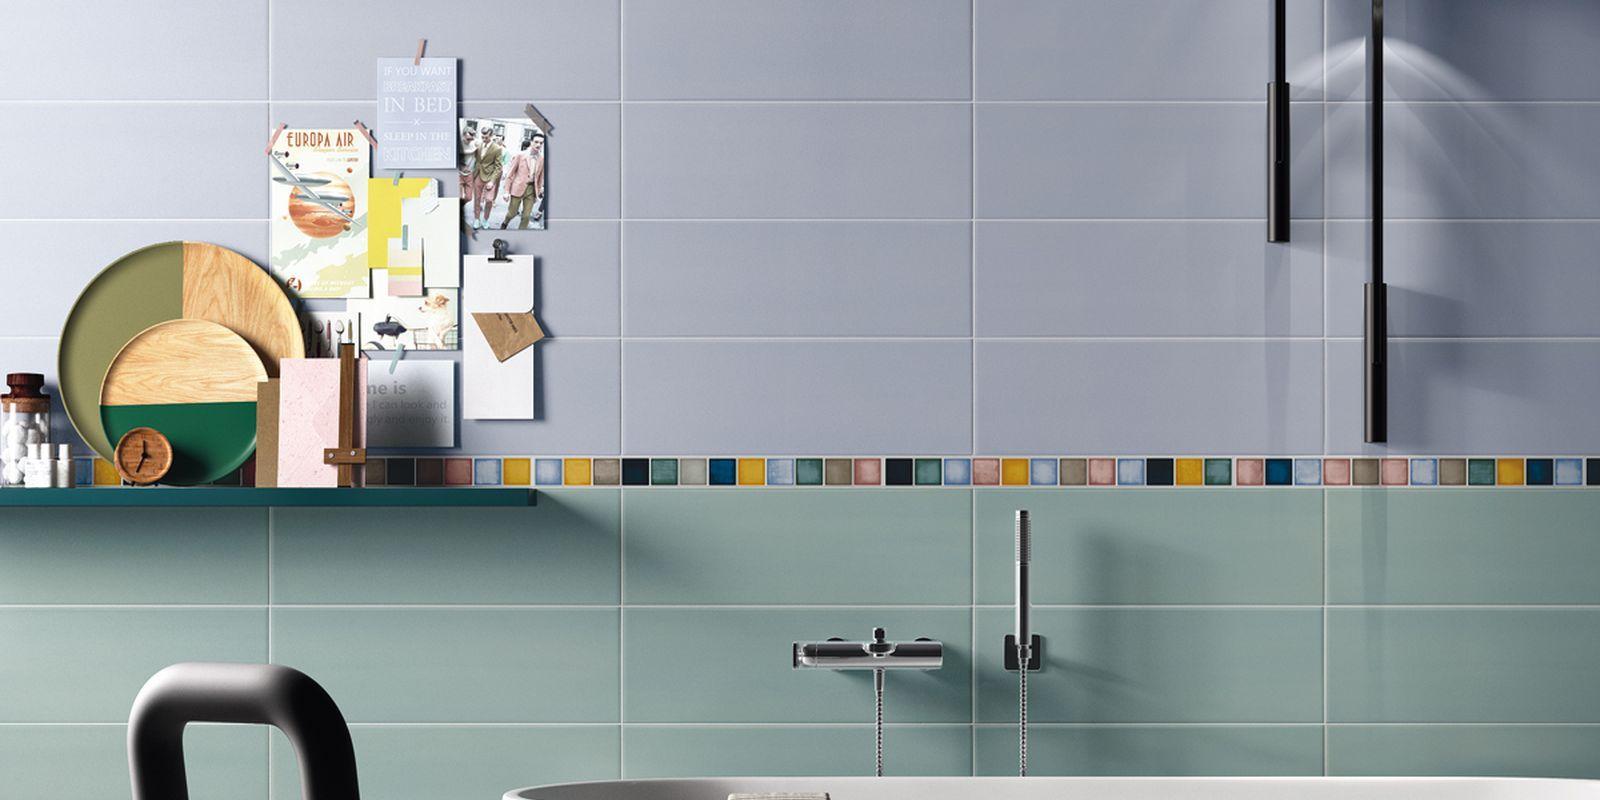 PIASTRELLE PLAY, bathroom modern ceramica double-fired wall tile [AM ...